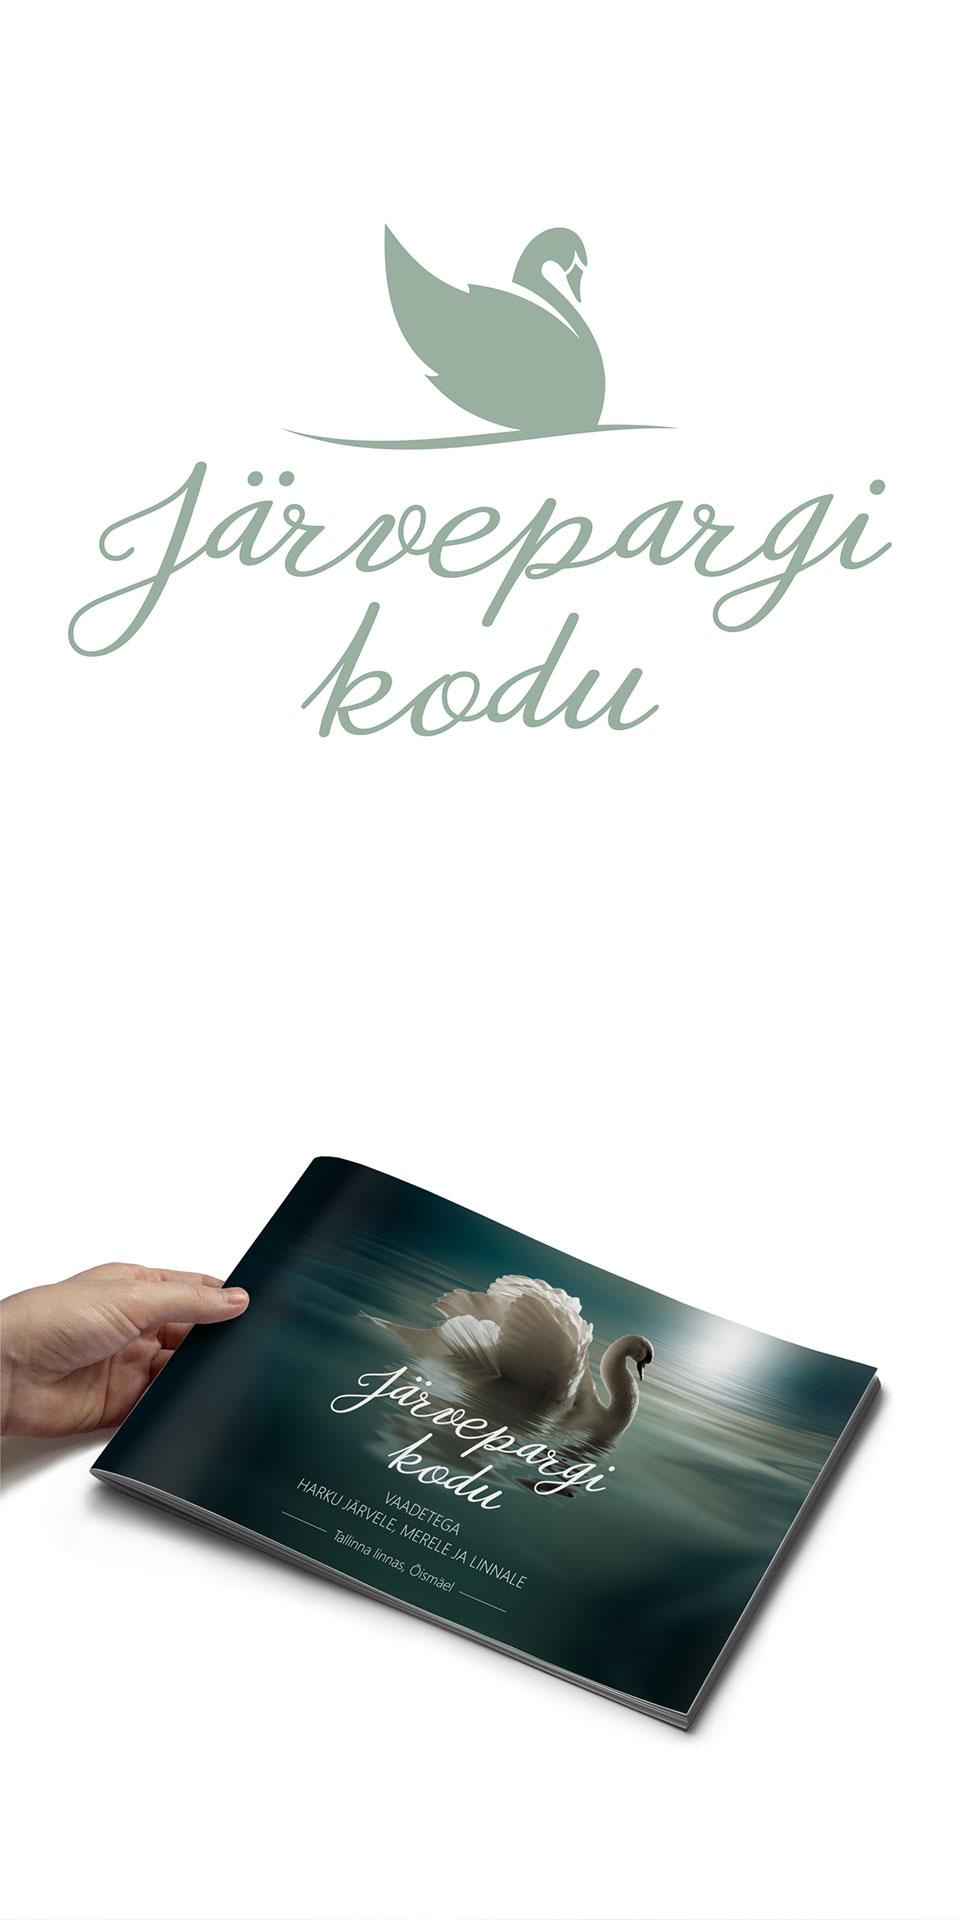 JarvepargiKodu-logo-1